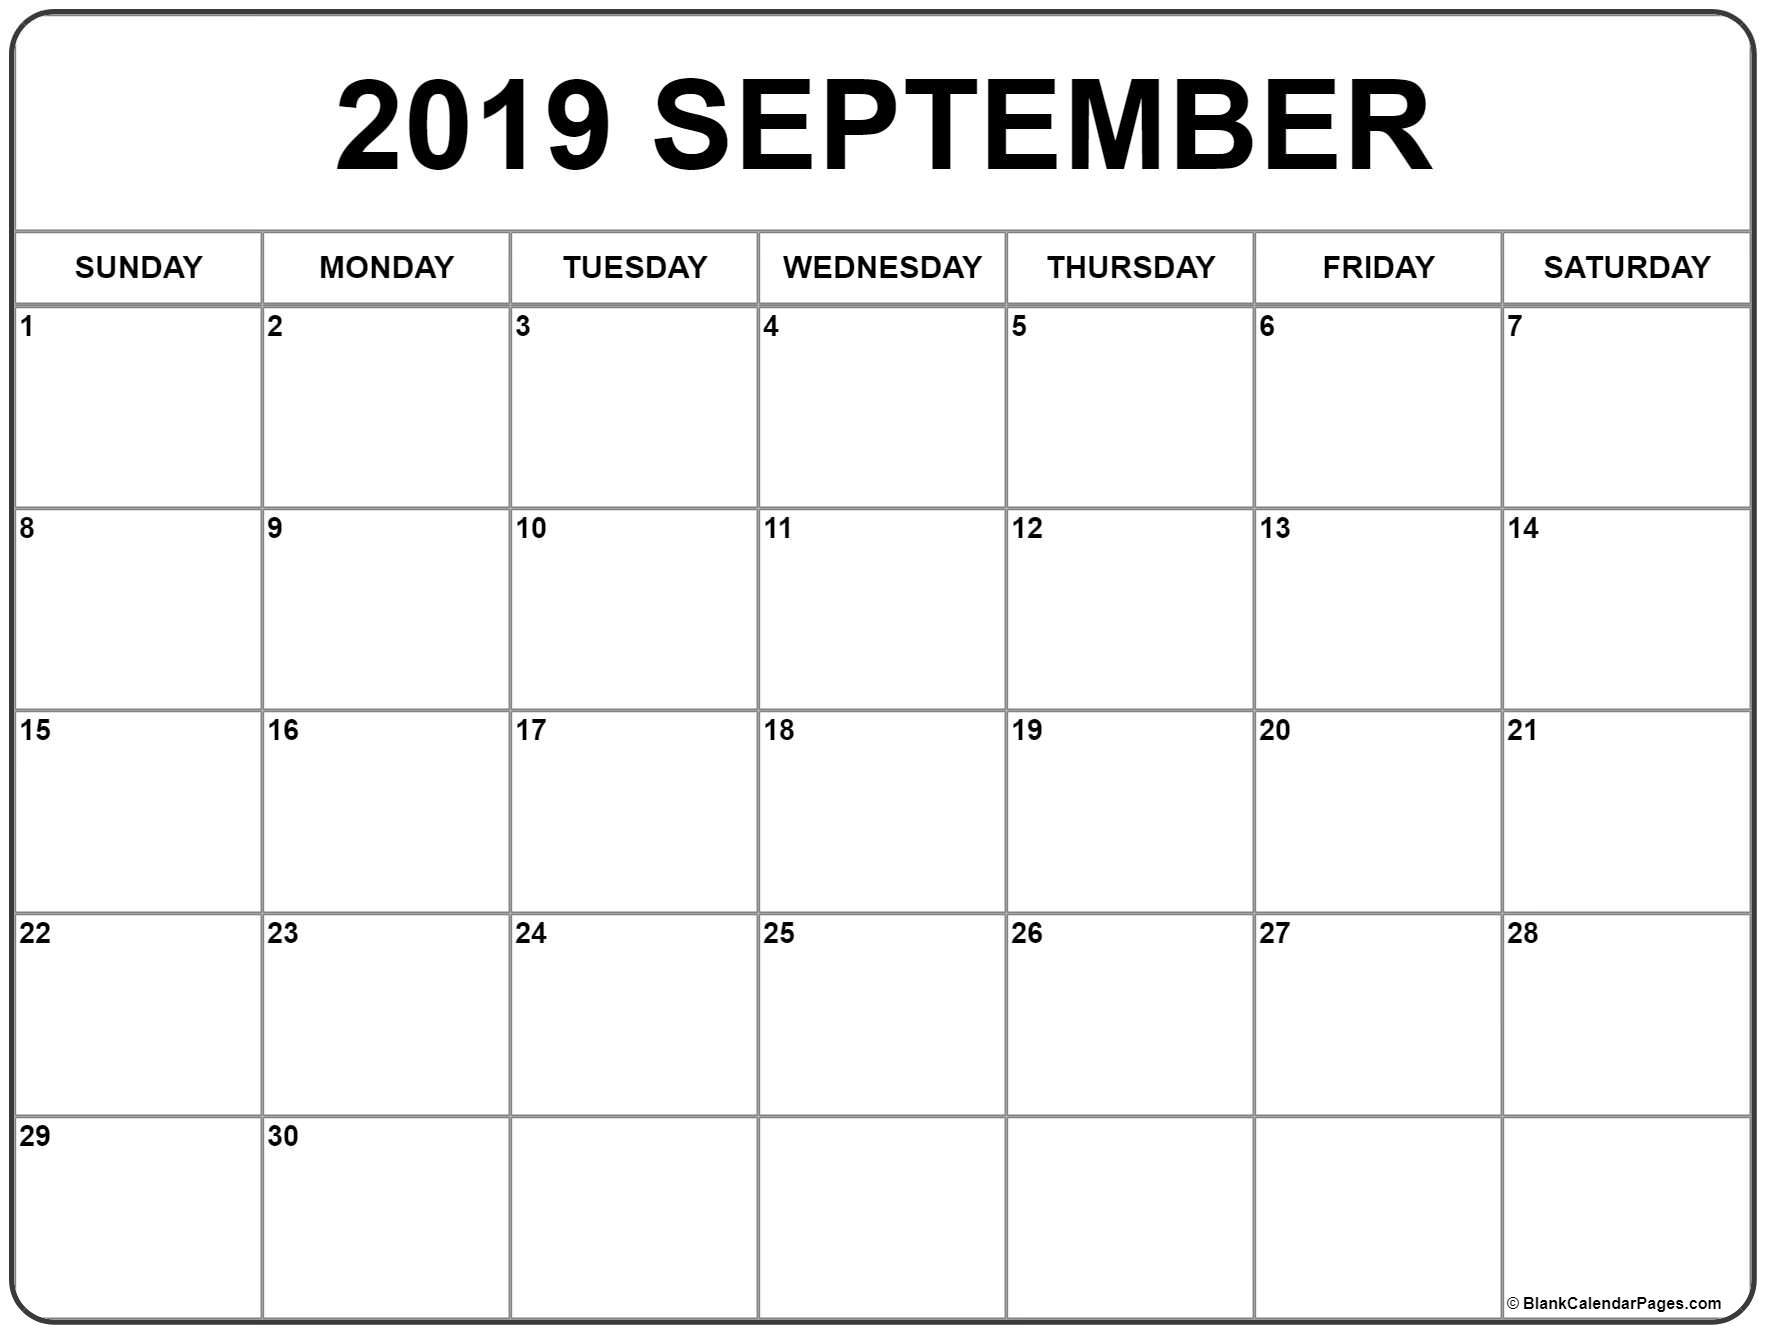 September 2019 Calendar | Free Printable Monthly Calendars regarding Blank Monthly Calendar September